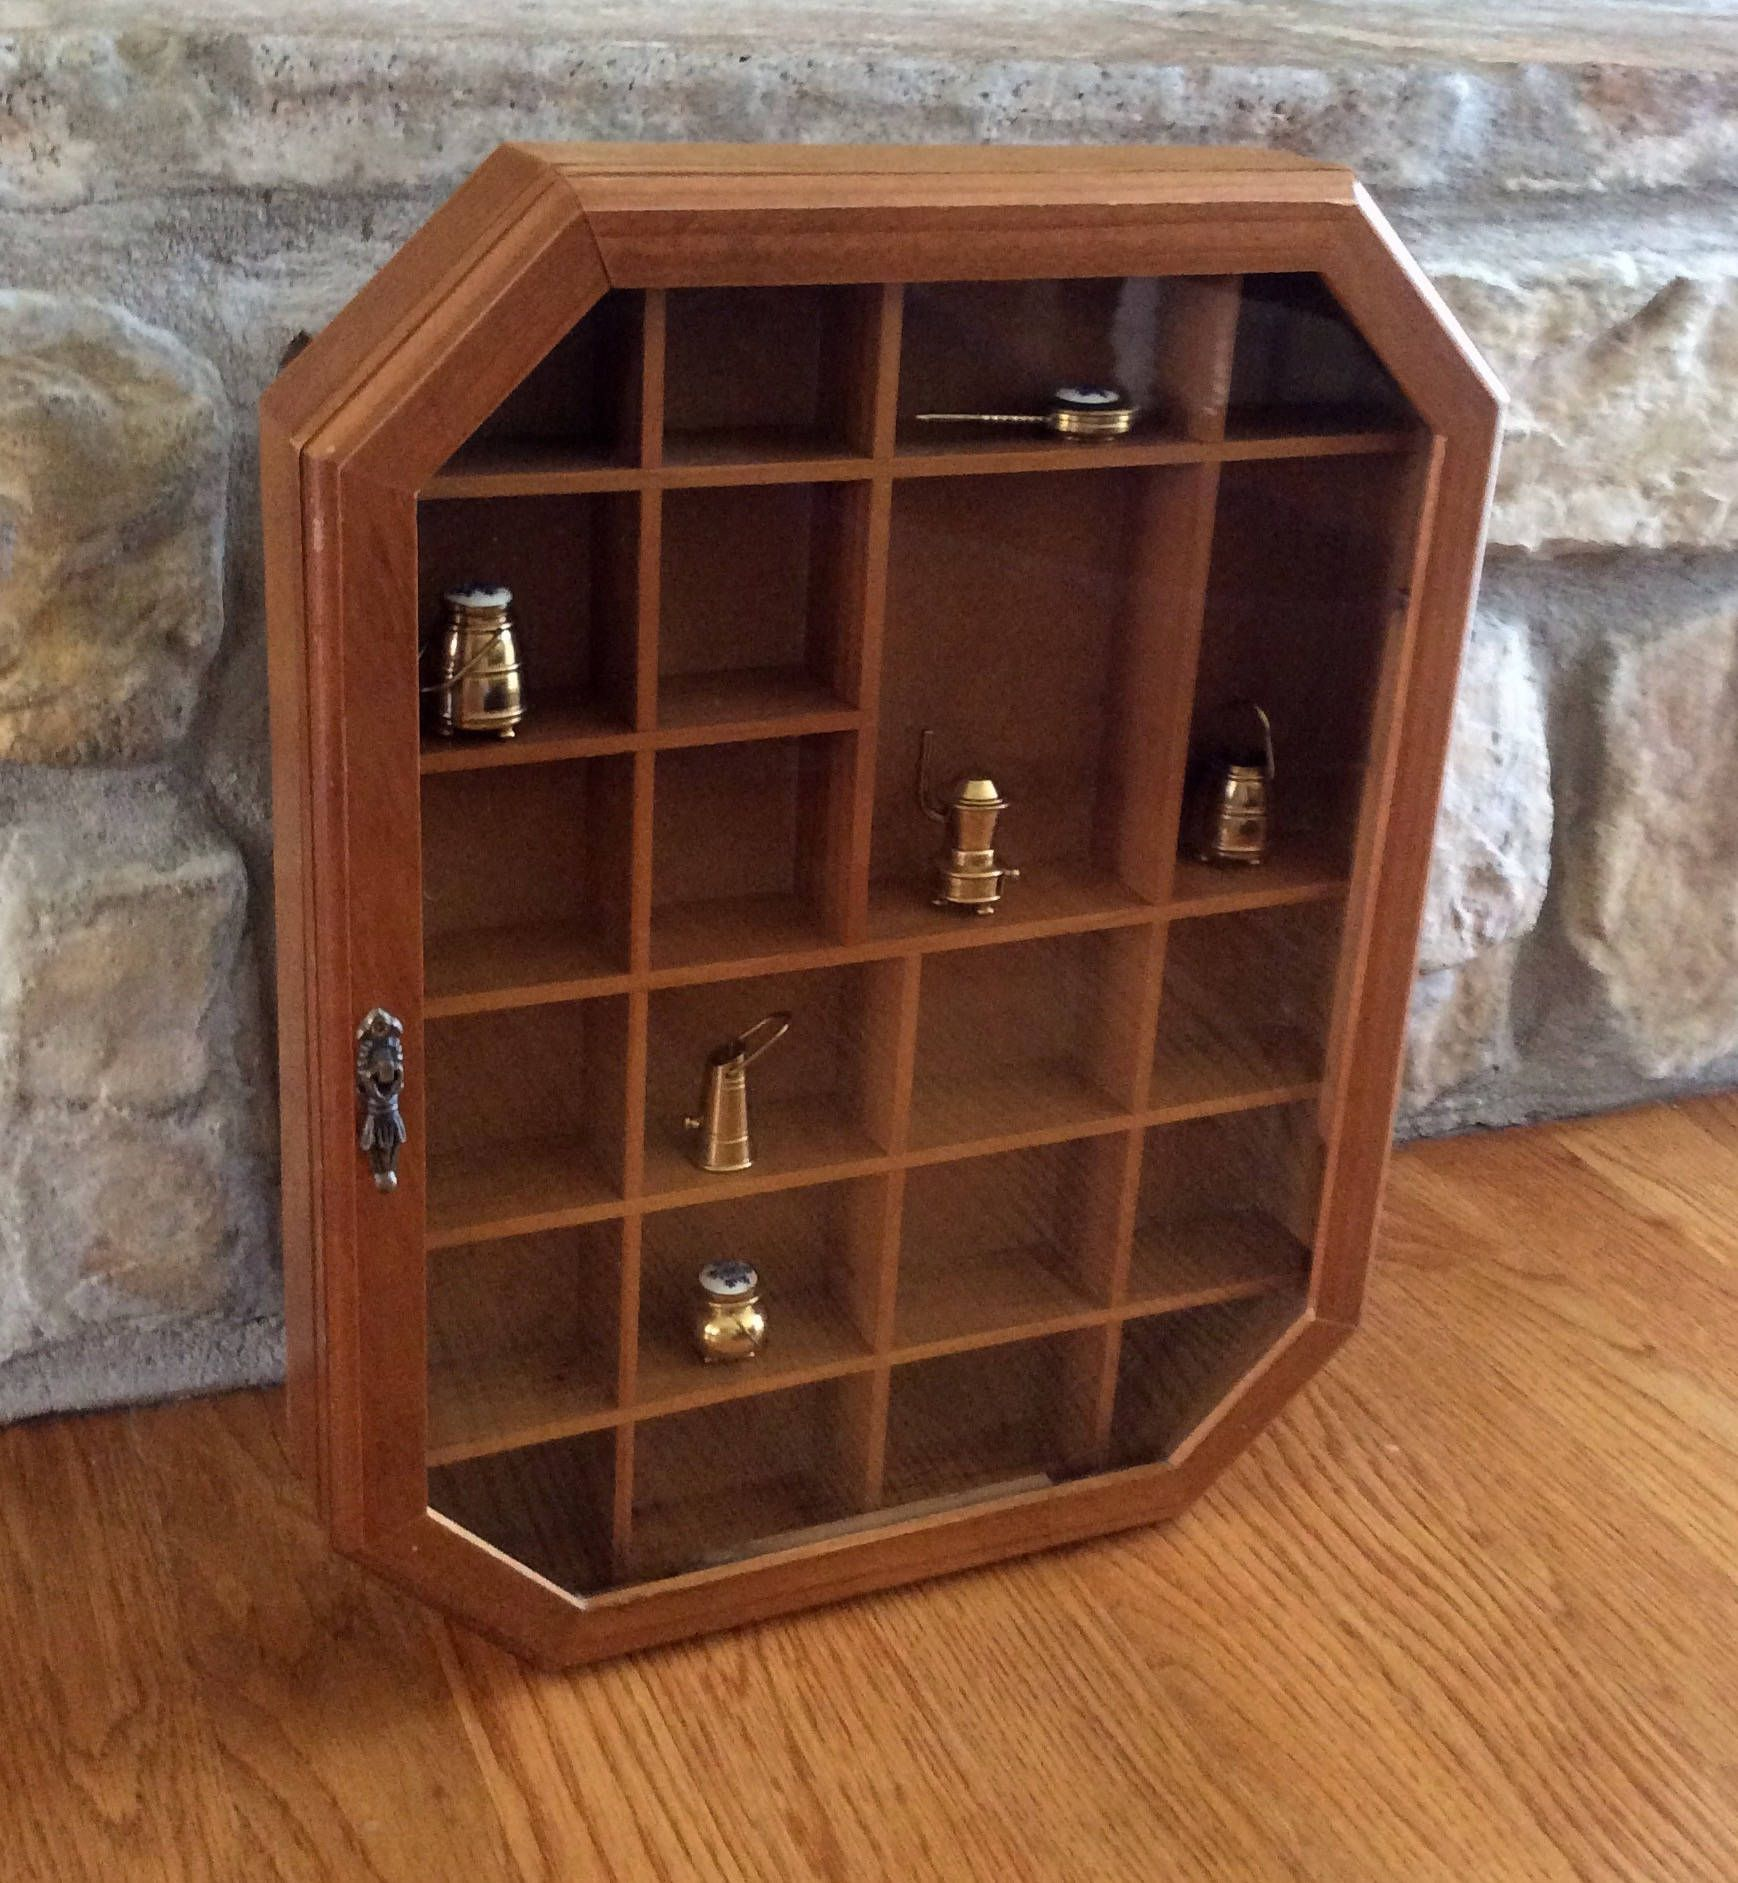 Vintage Octagon, Wood U0026 Glass Shadow Box, Wall Curio Cabinet, Miniature  Storage,